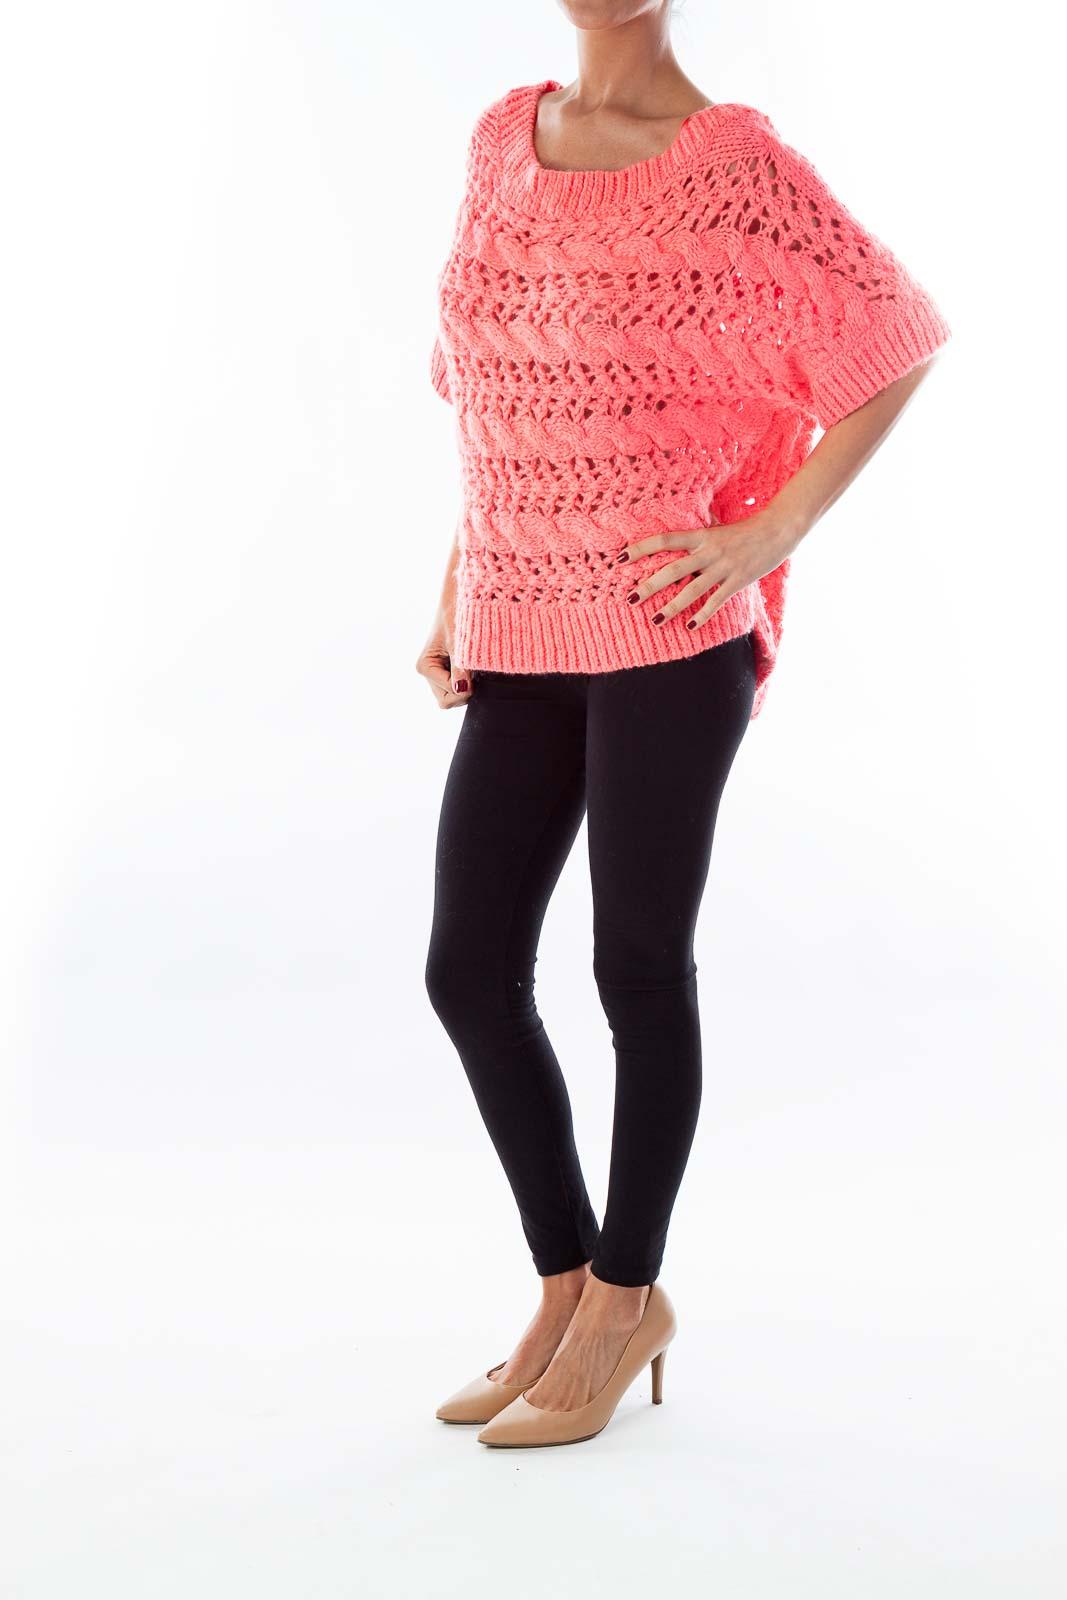 Hot Pink Short Sleeve Sweater [M] - SilkRoll